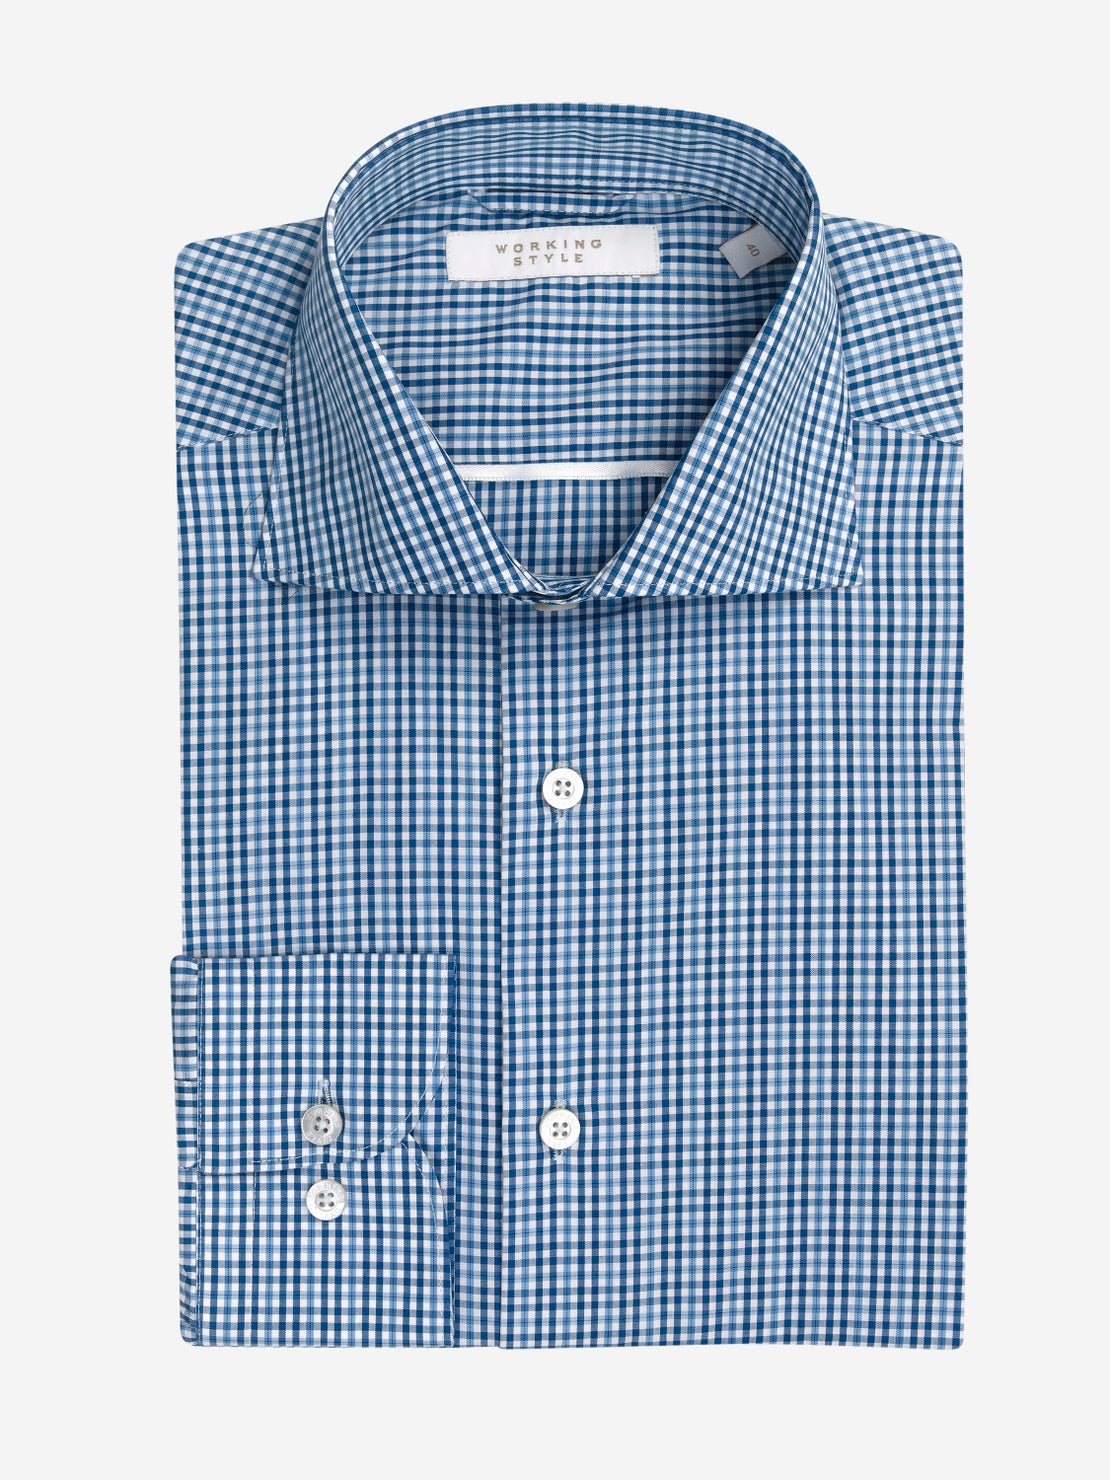 Cobalt, Navy & White Check Shirt